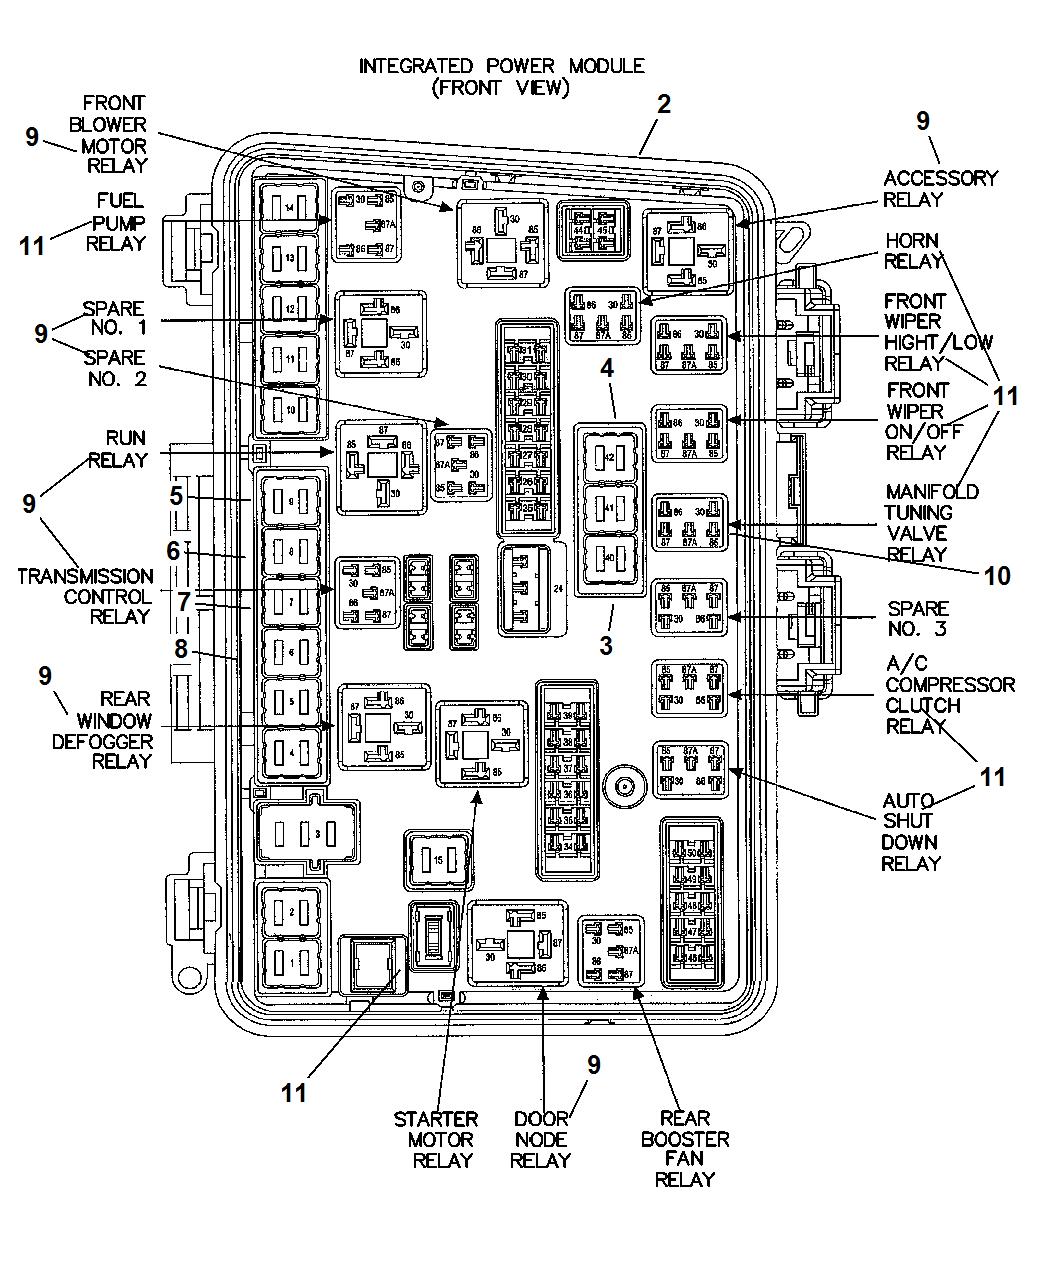 2008 chrysler pacifica fuse box diagram pt cruiser fuse box wiring diagram e1 wiring diagram  pt cruiser fuse box wiring diagram e1